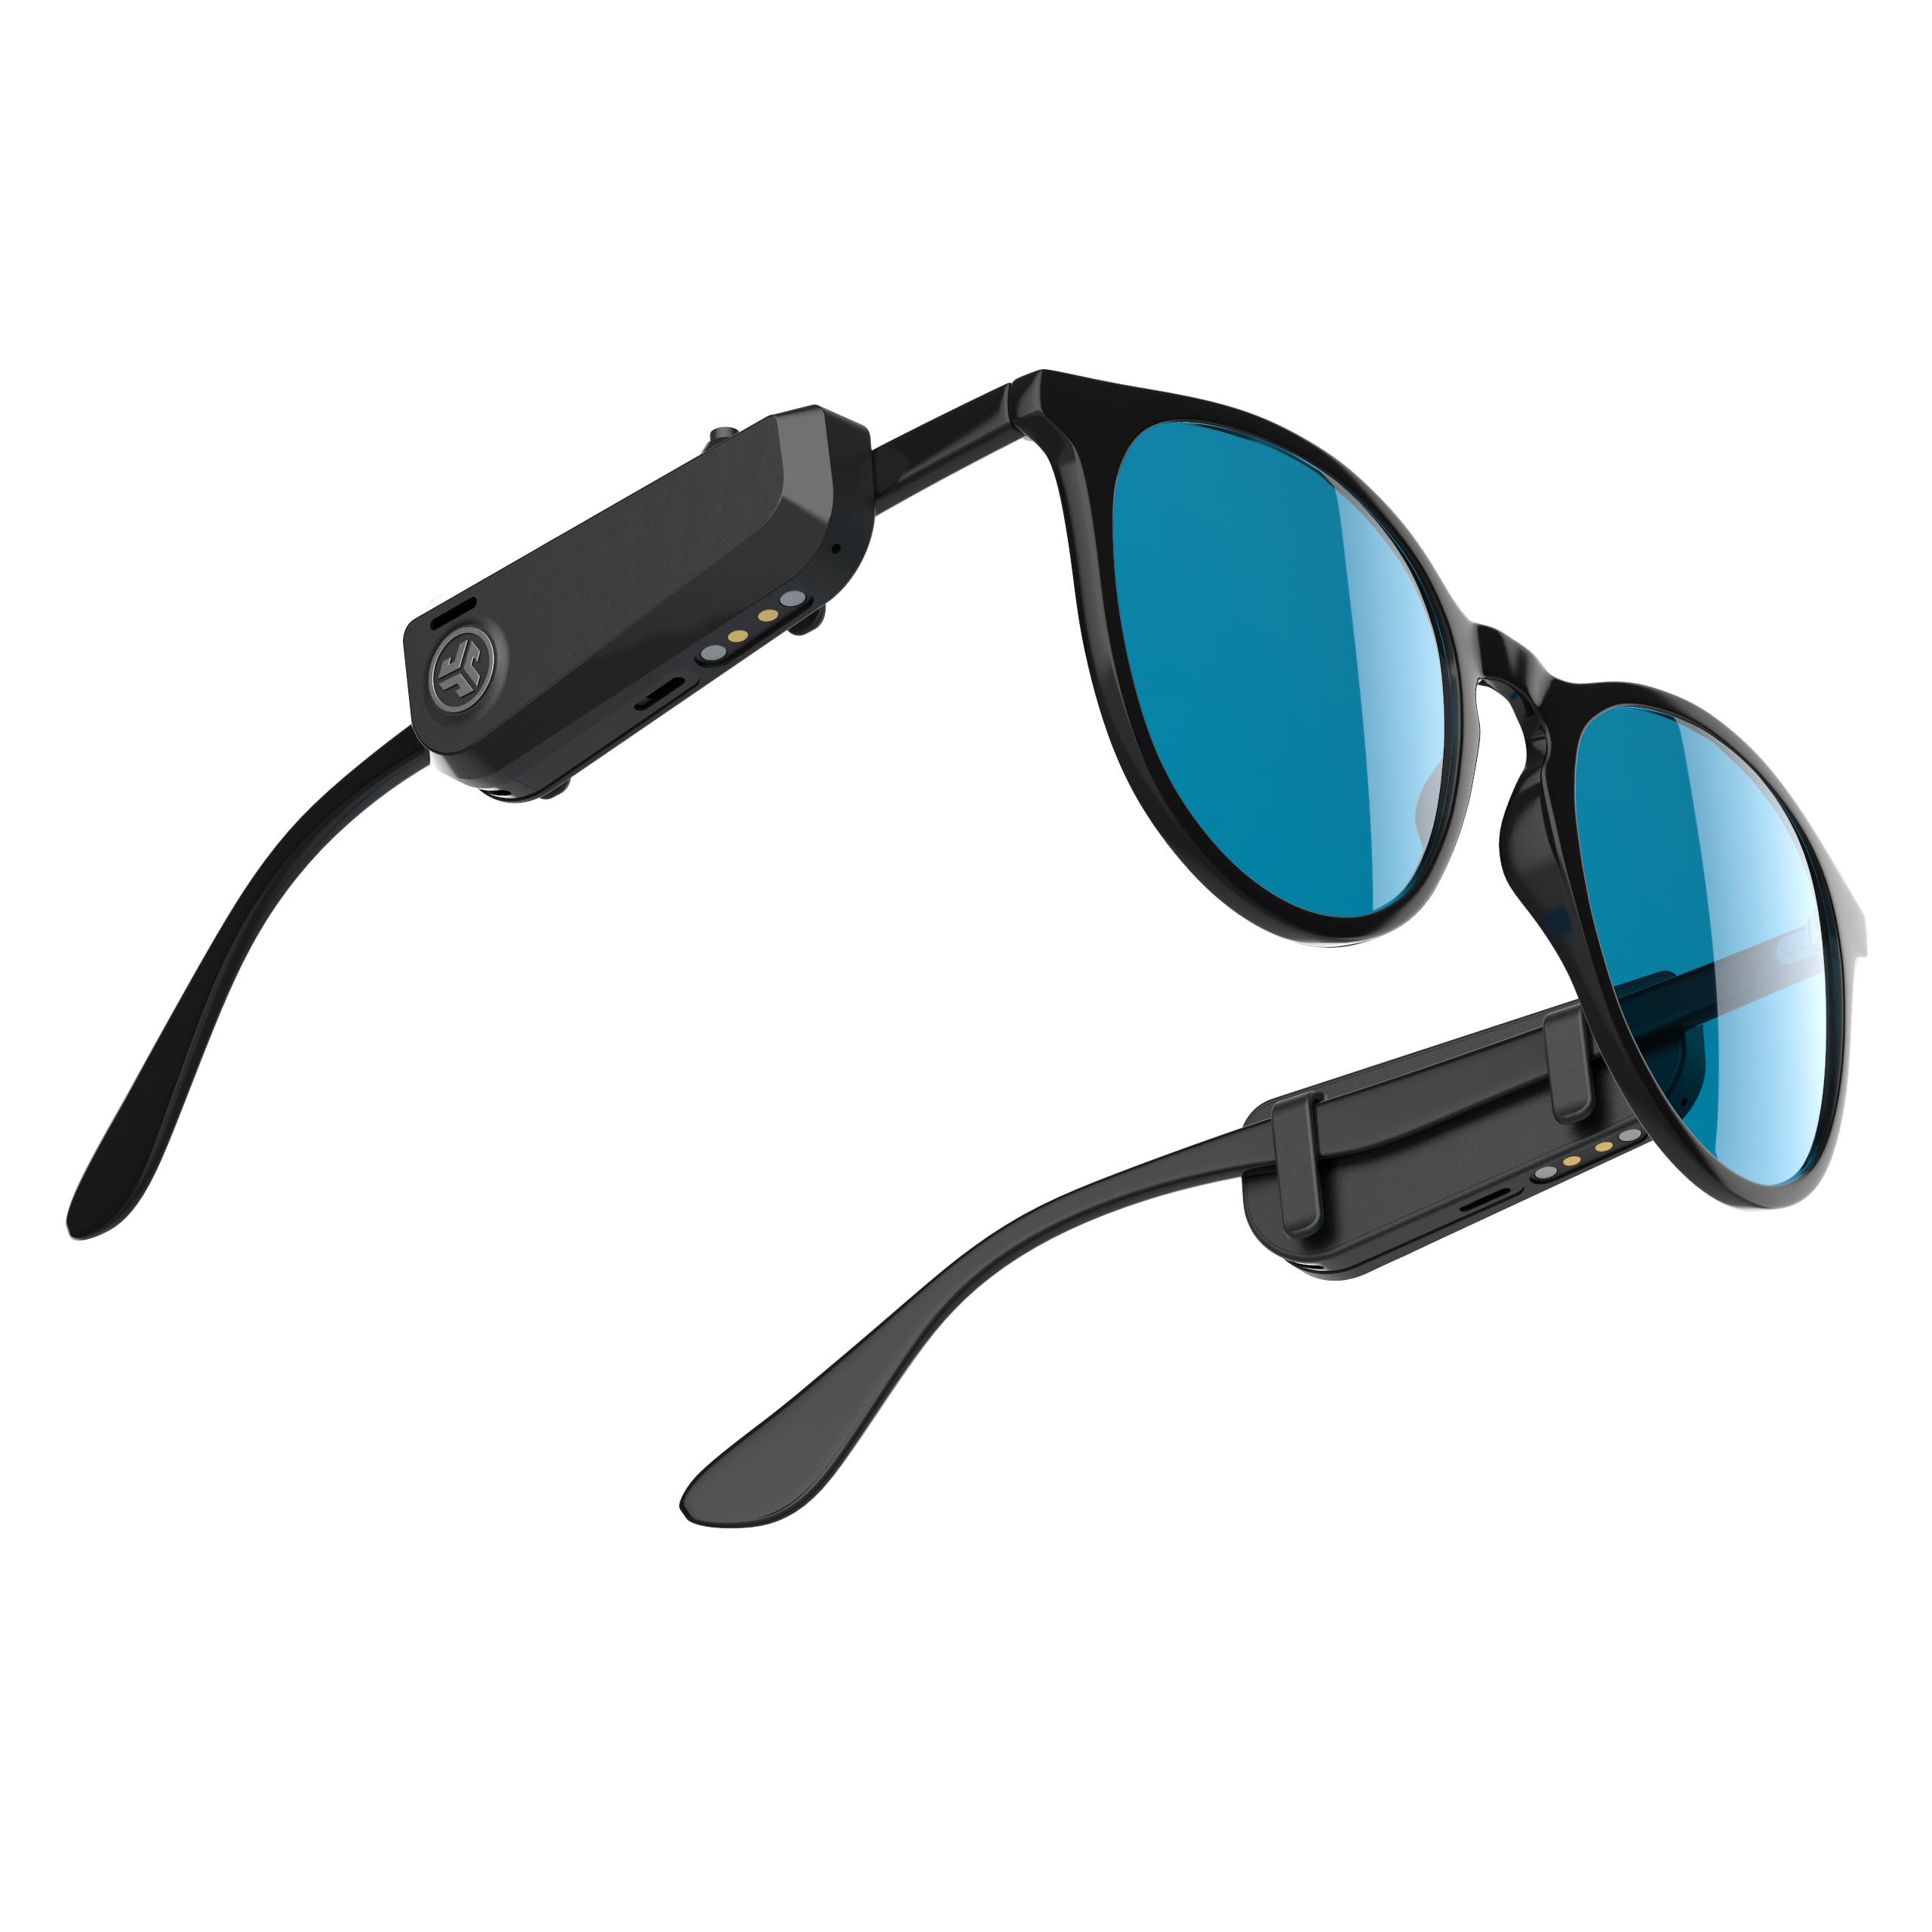 JLab Jbuds Frames on sunglasses